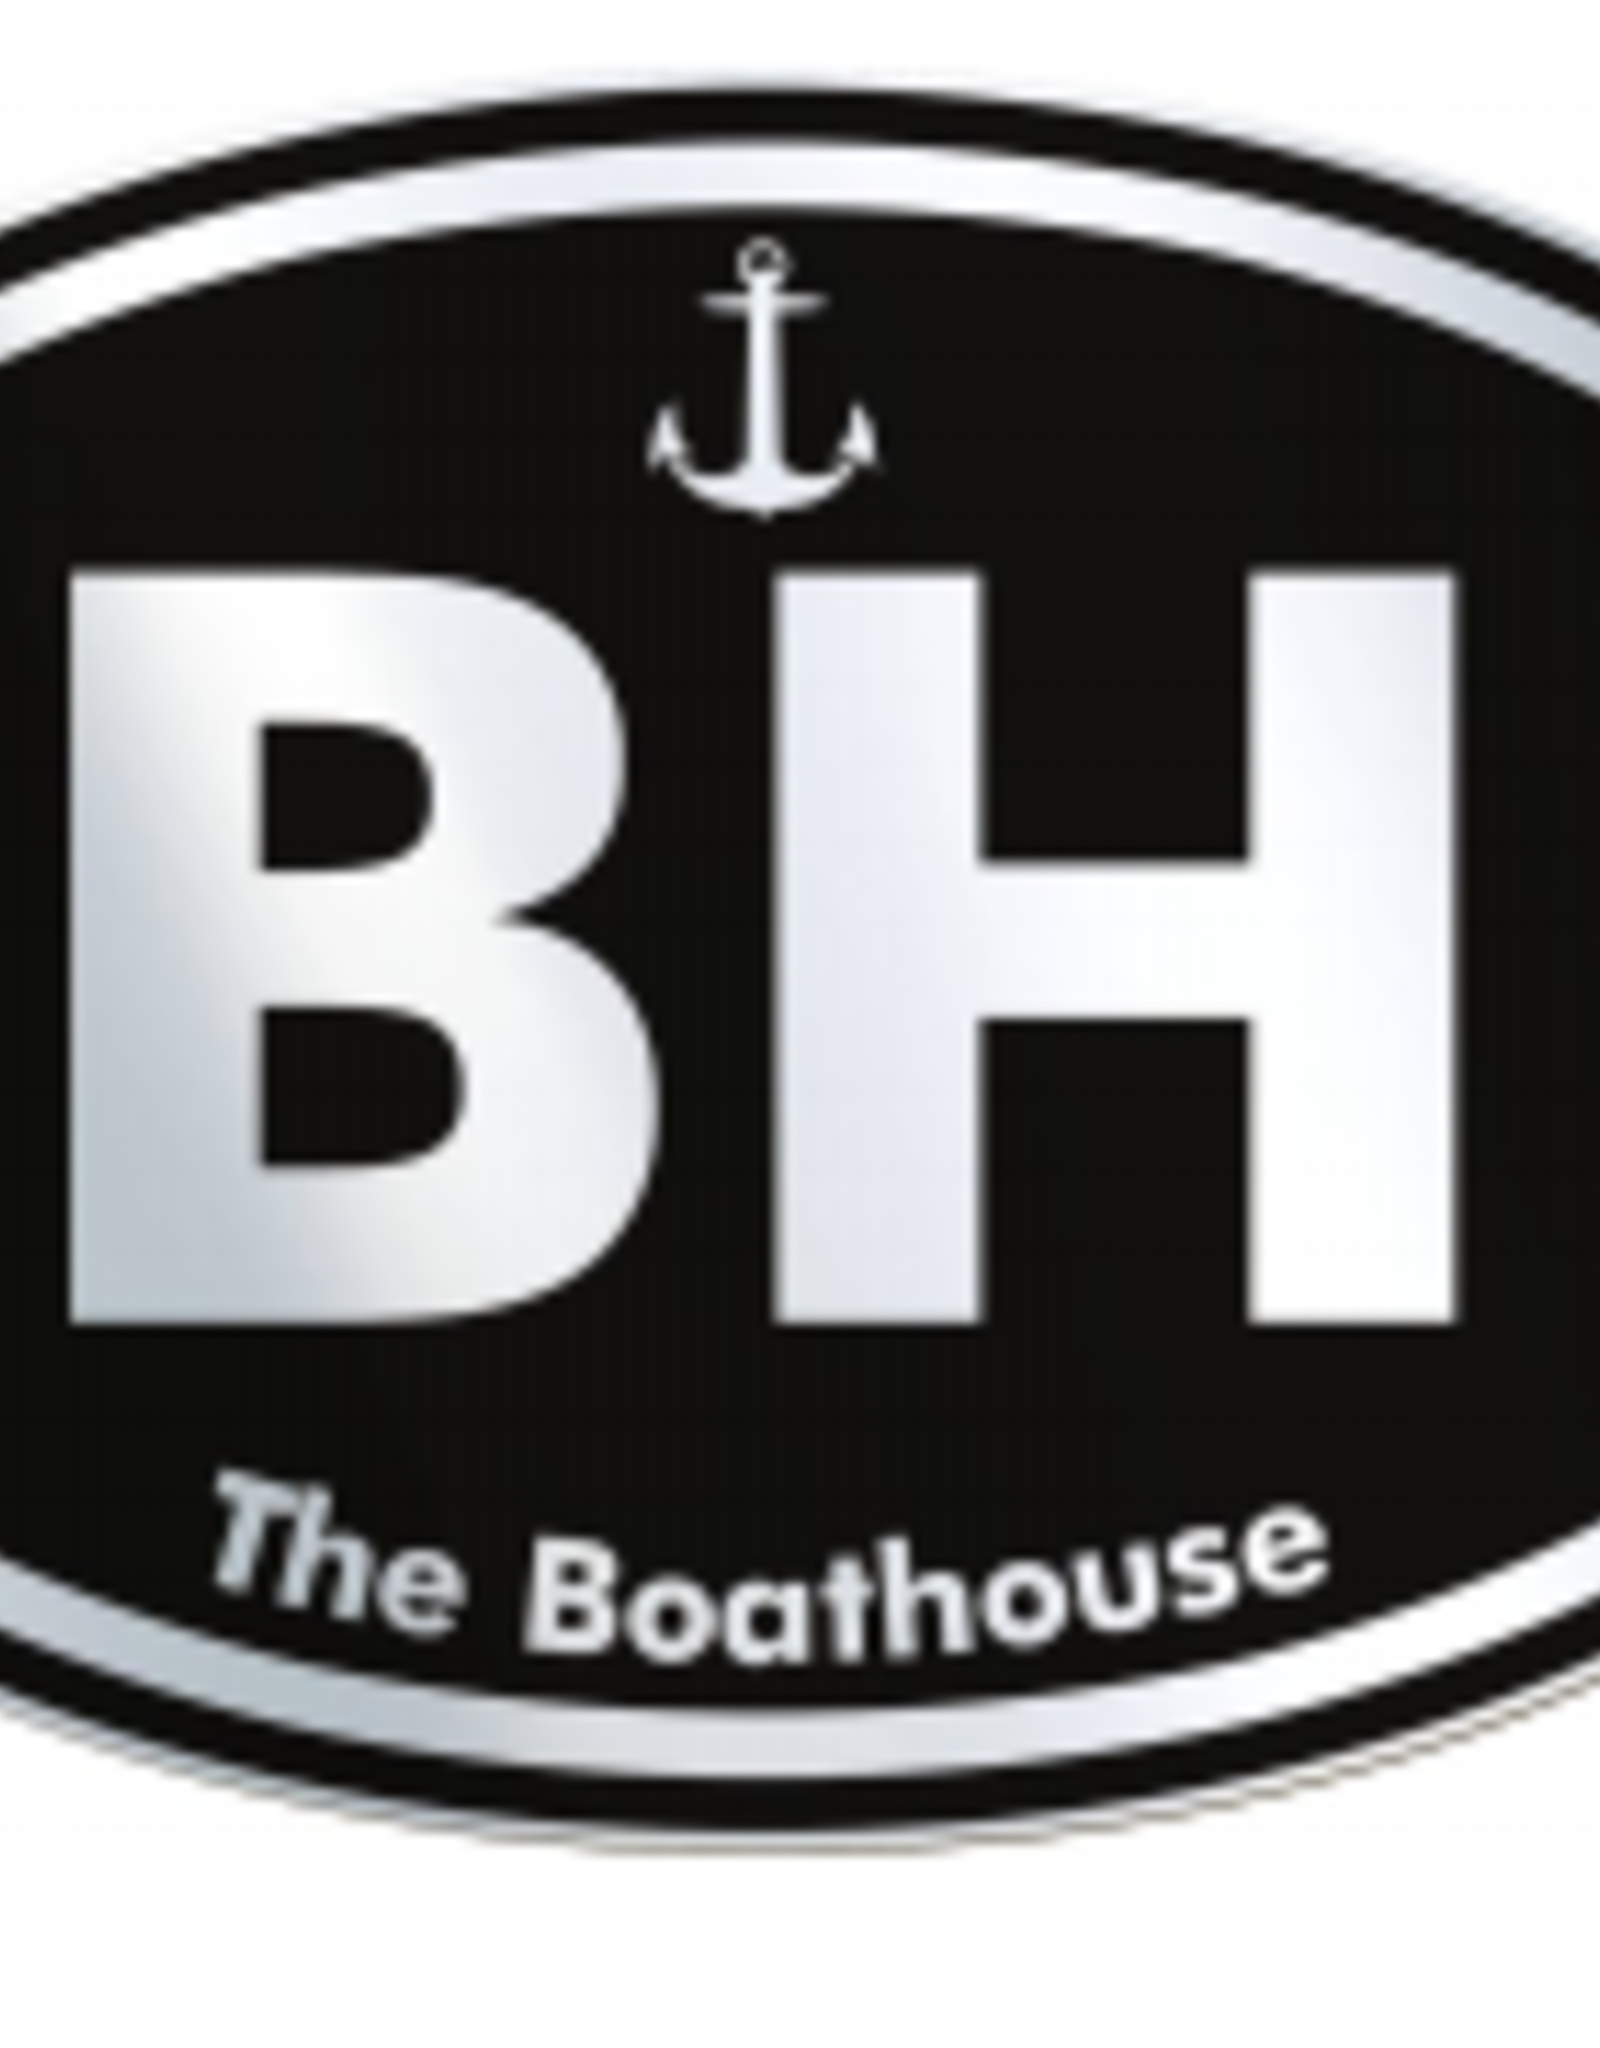 BUCKET WONDERS BW BOATHOUSE BH  CHROME STICKER